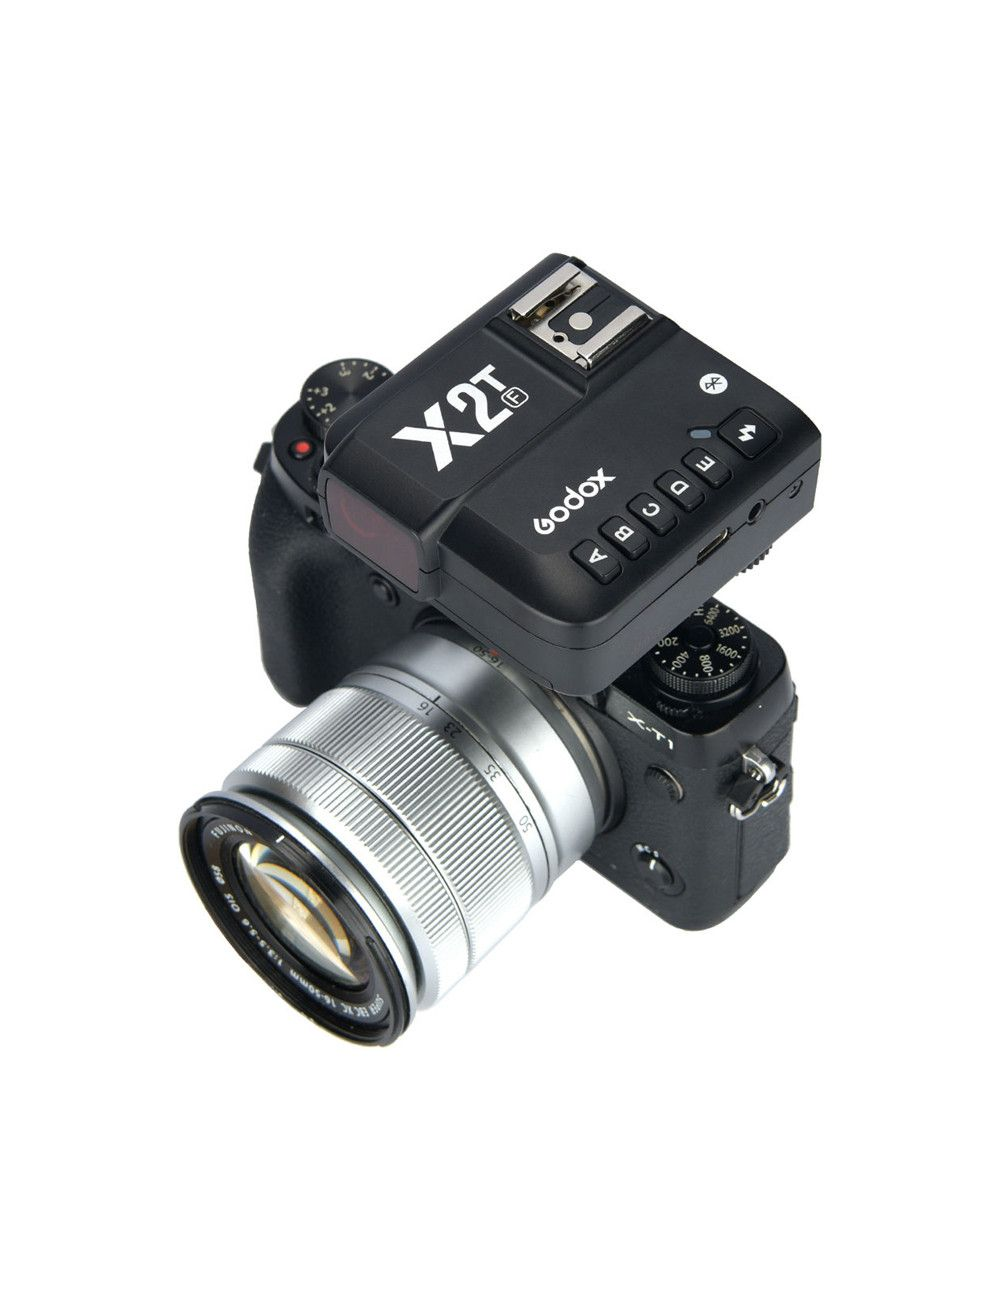 Lente Tamron para Nikon 10-24mm F/3.5-4.5 Di II VC HLD en Chile Apertura.cl